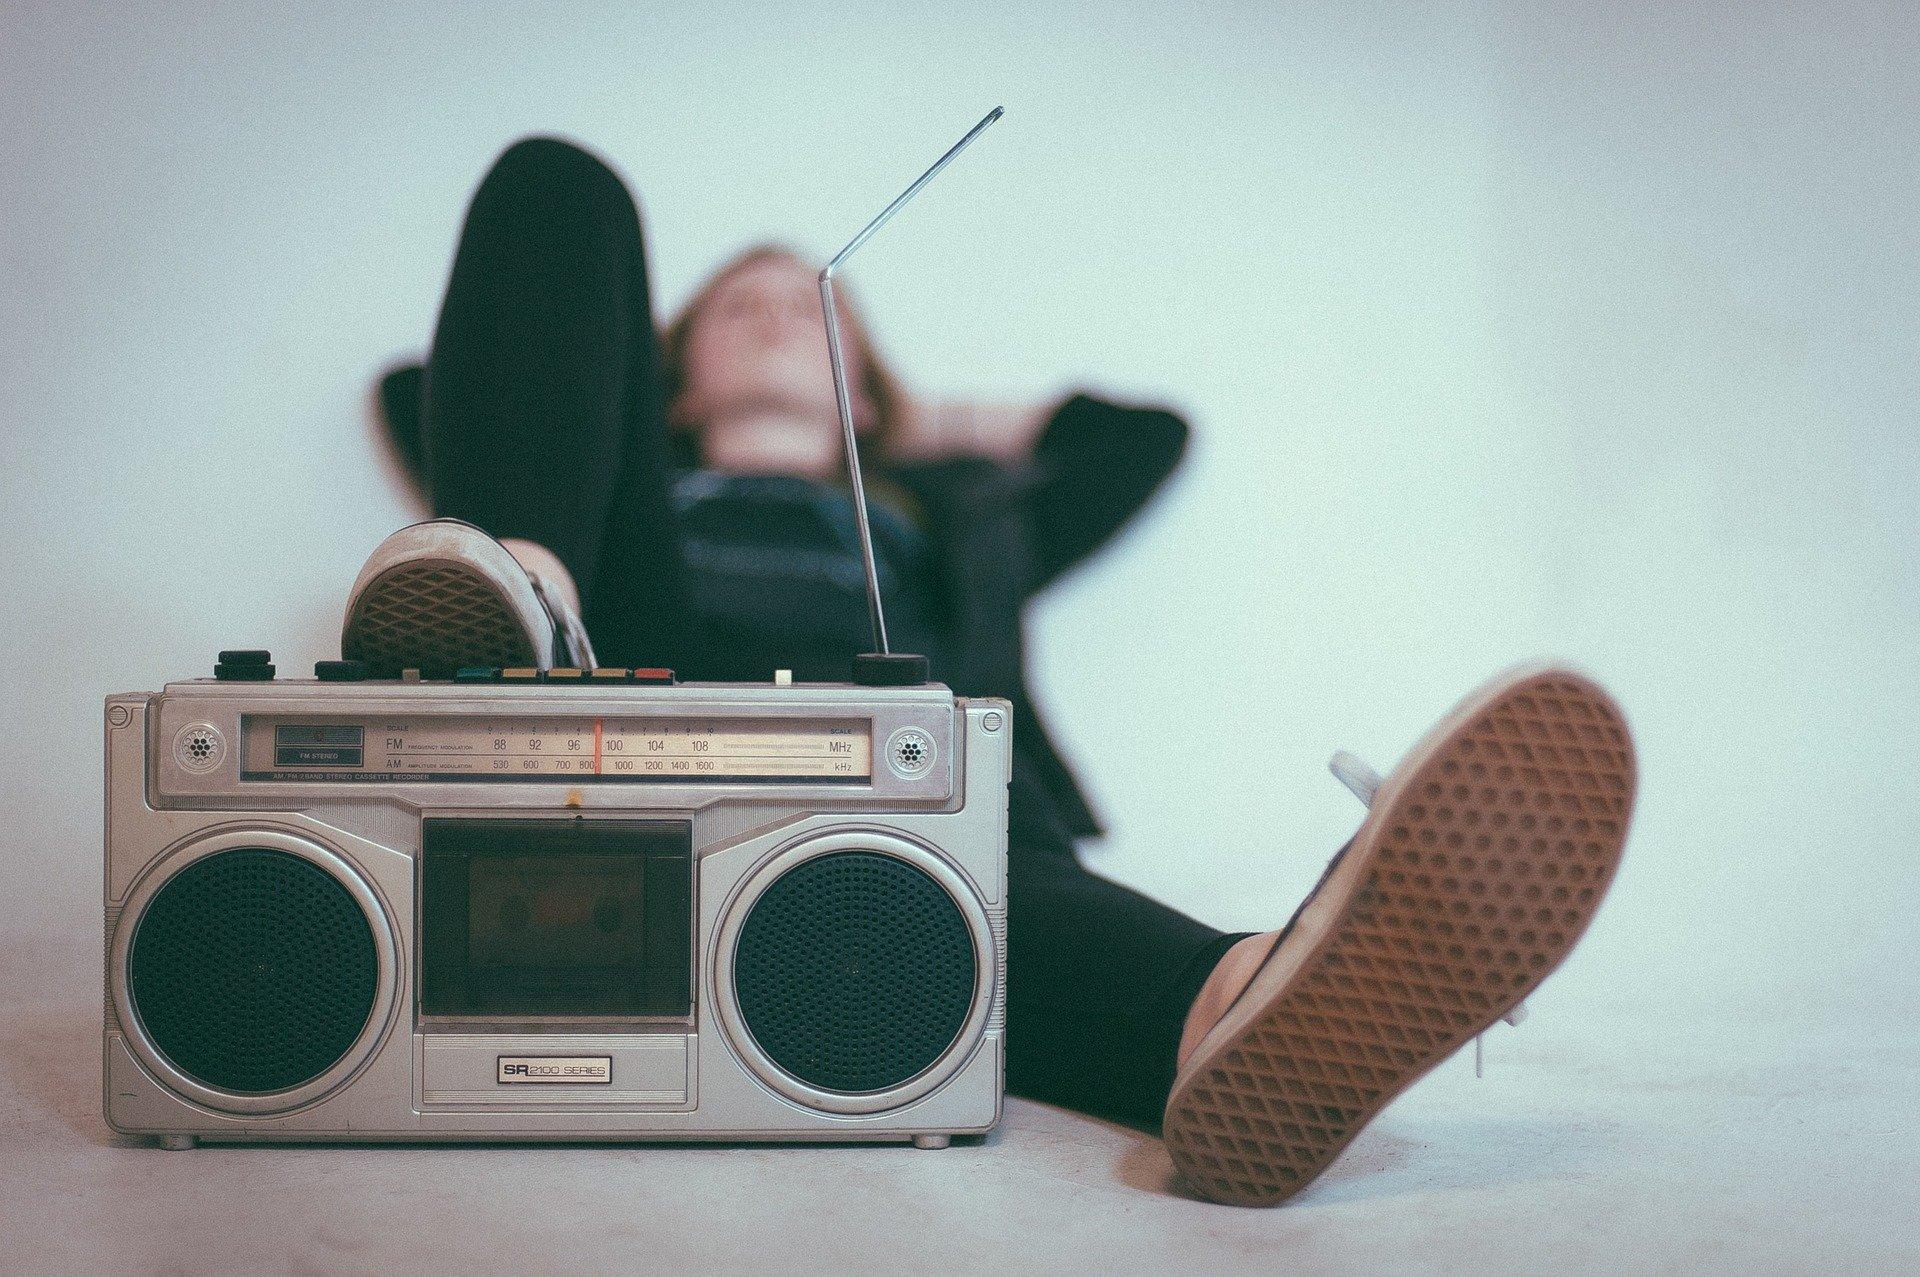 Die Besten Radiosender